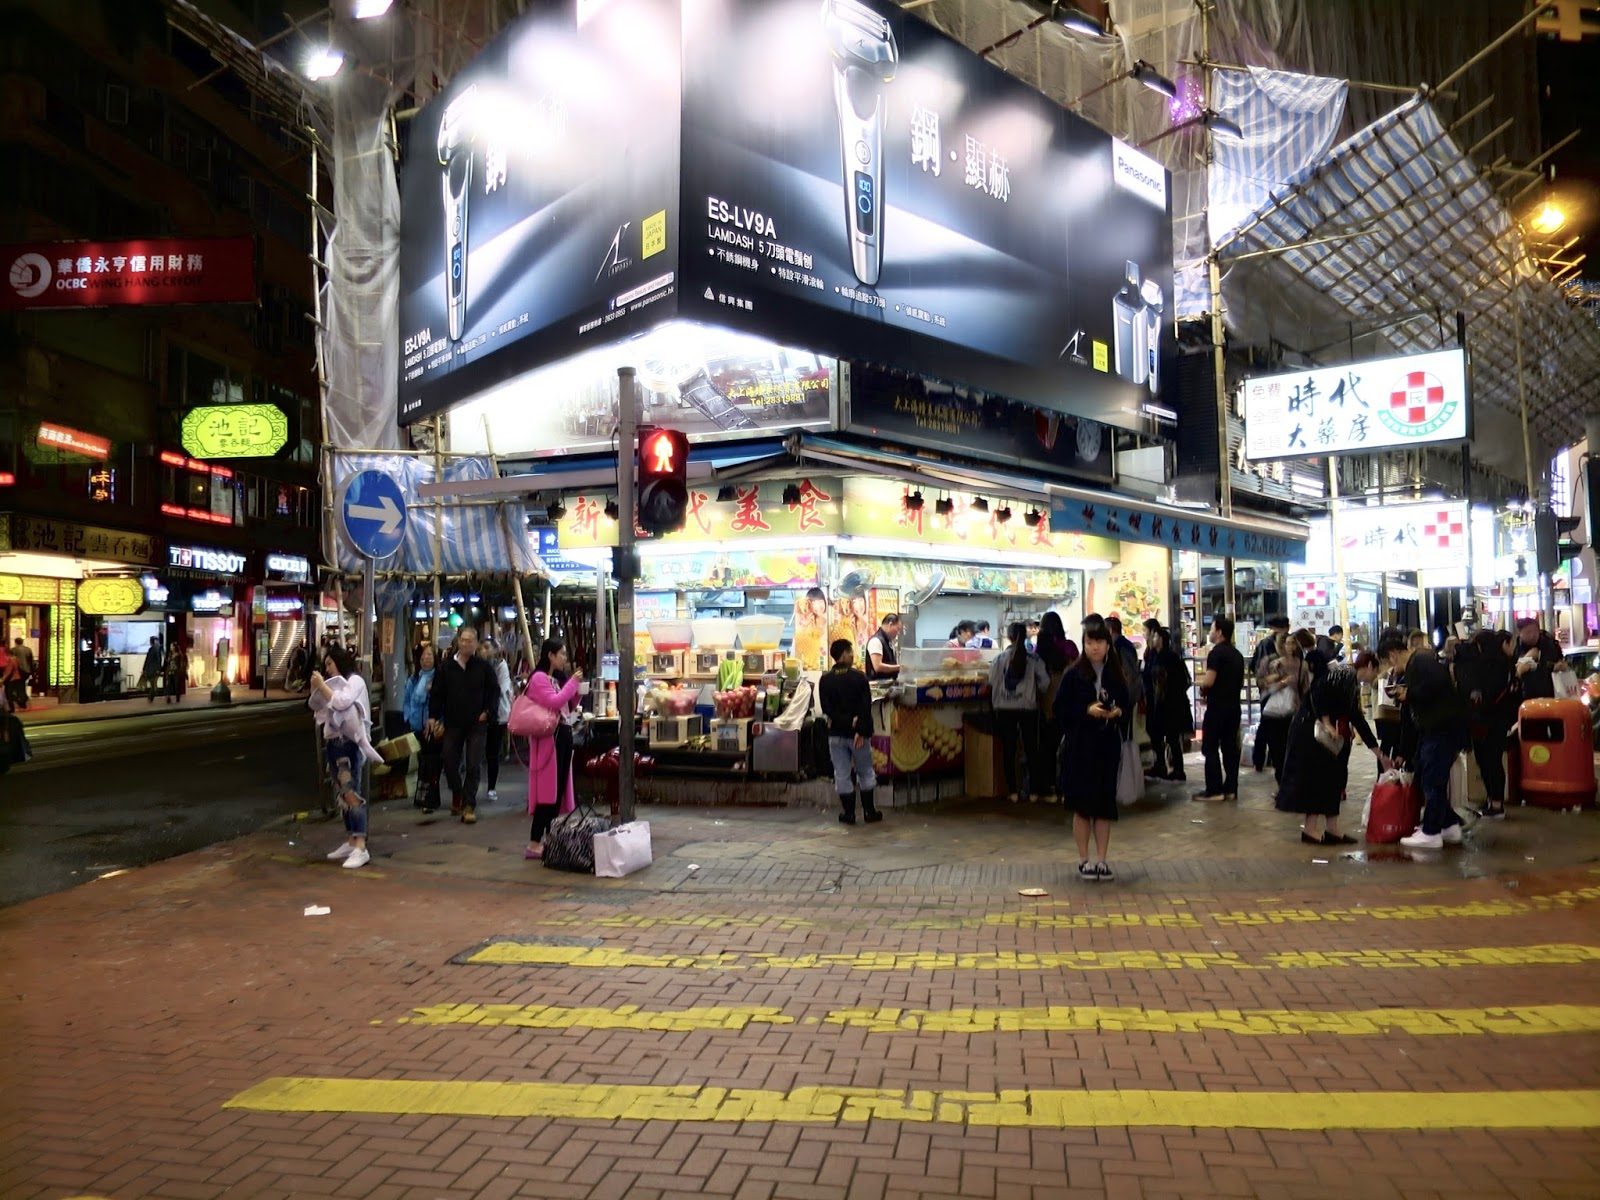 causeway bay, hong kong, travel, photography, street food